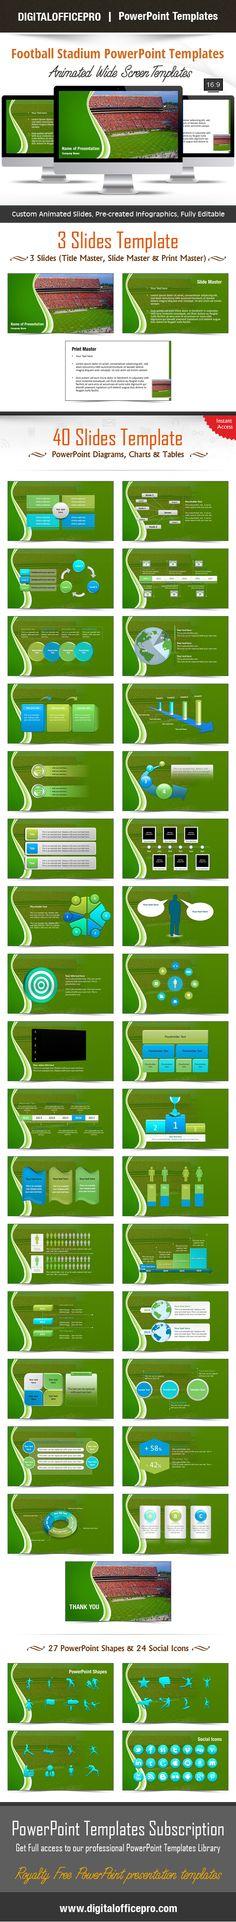 Soccer Ball Powerpoint Presentation Template Football Powerpoint - Luxury football ppt template concept